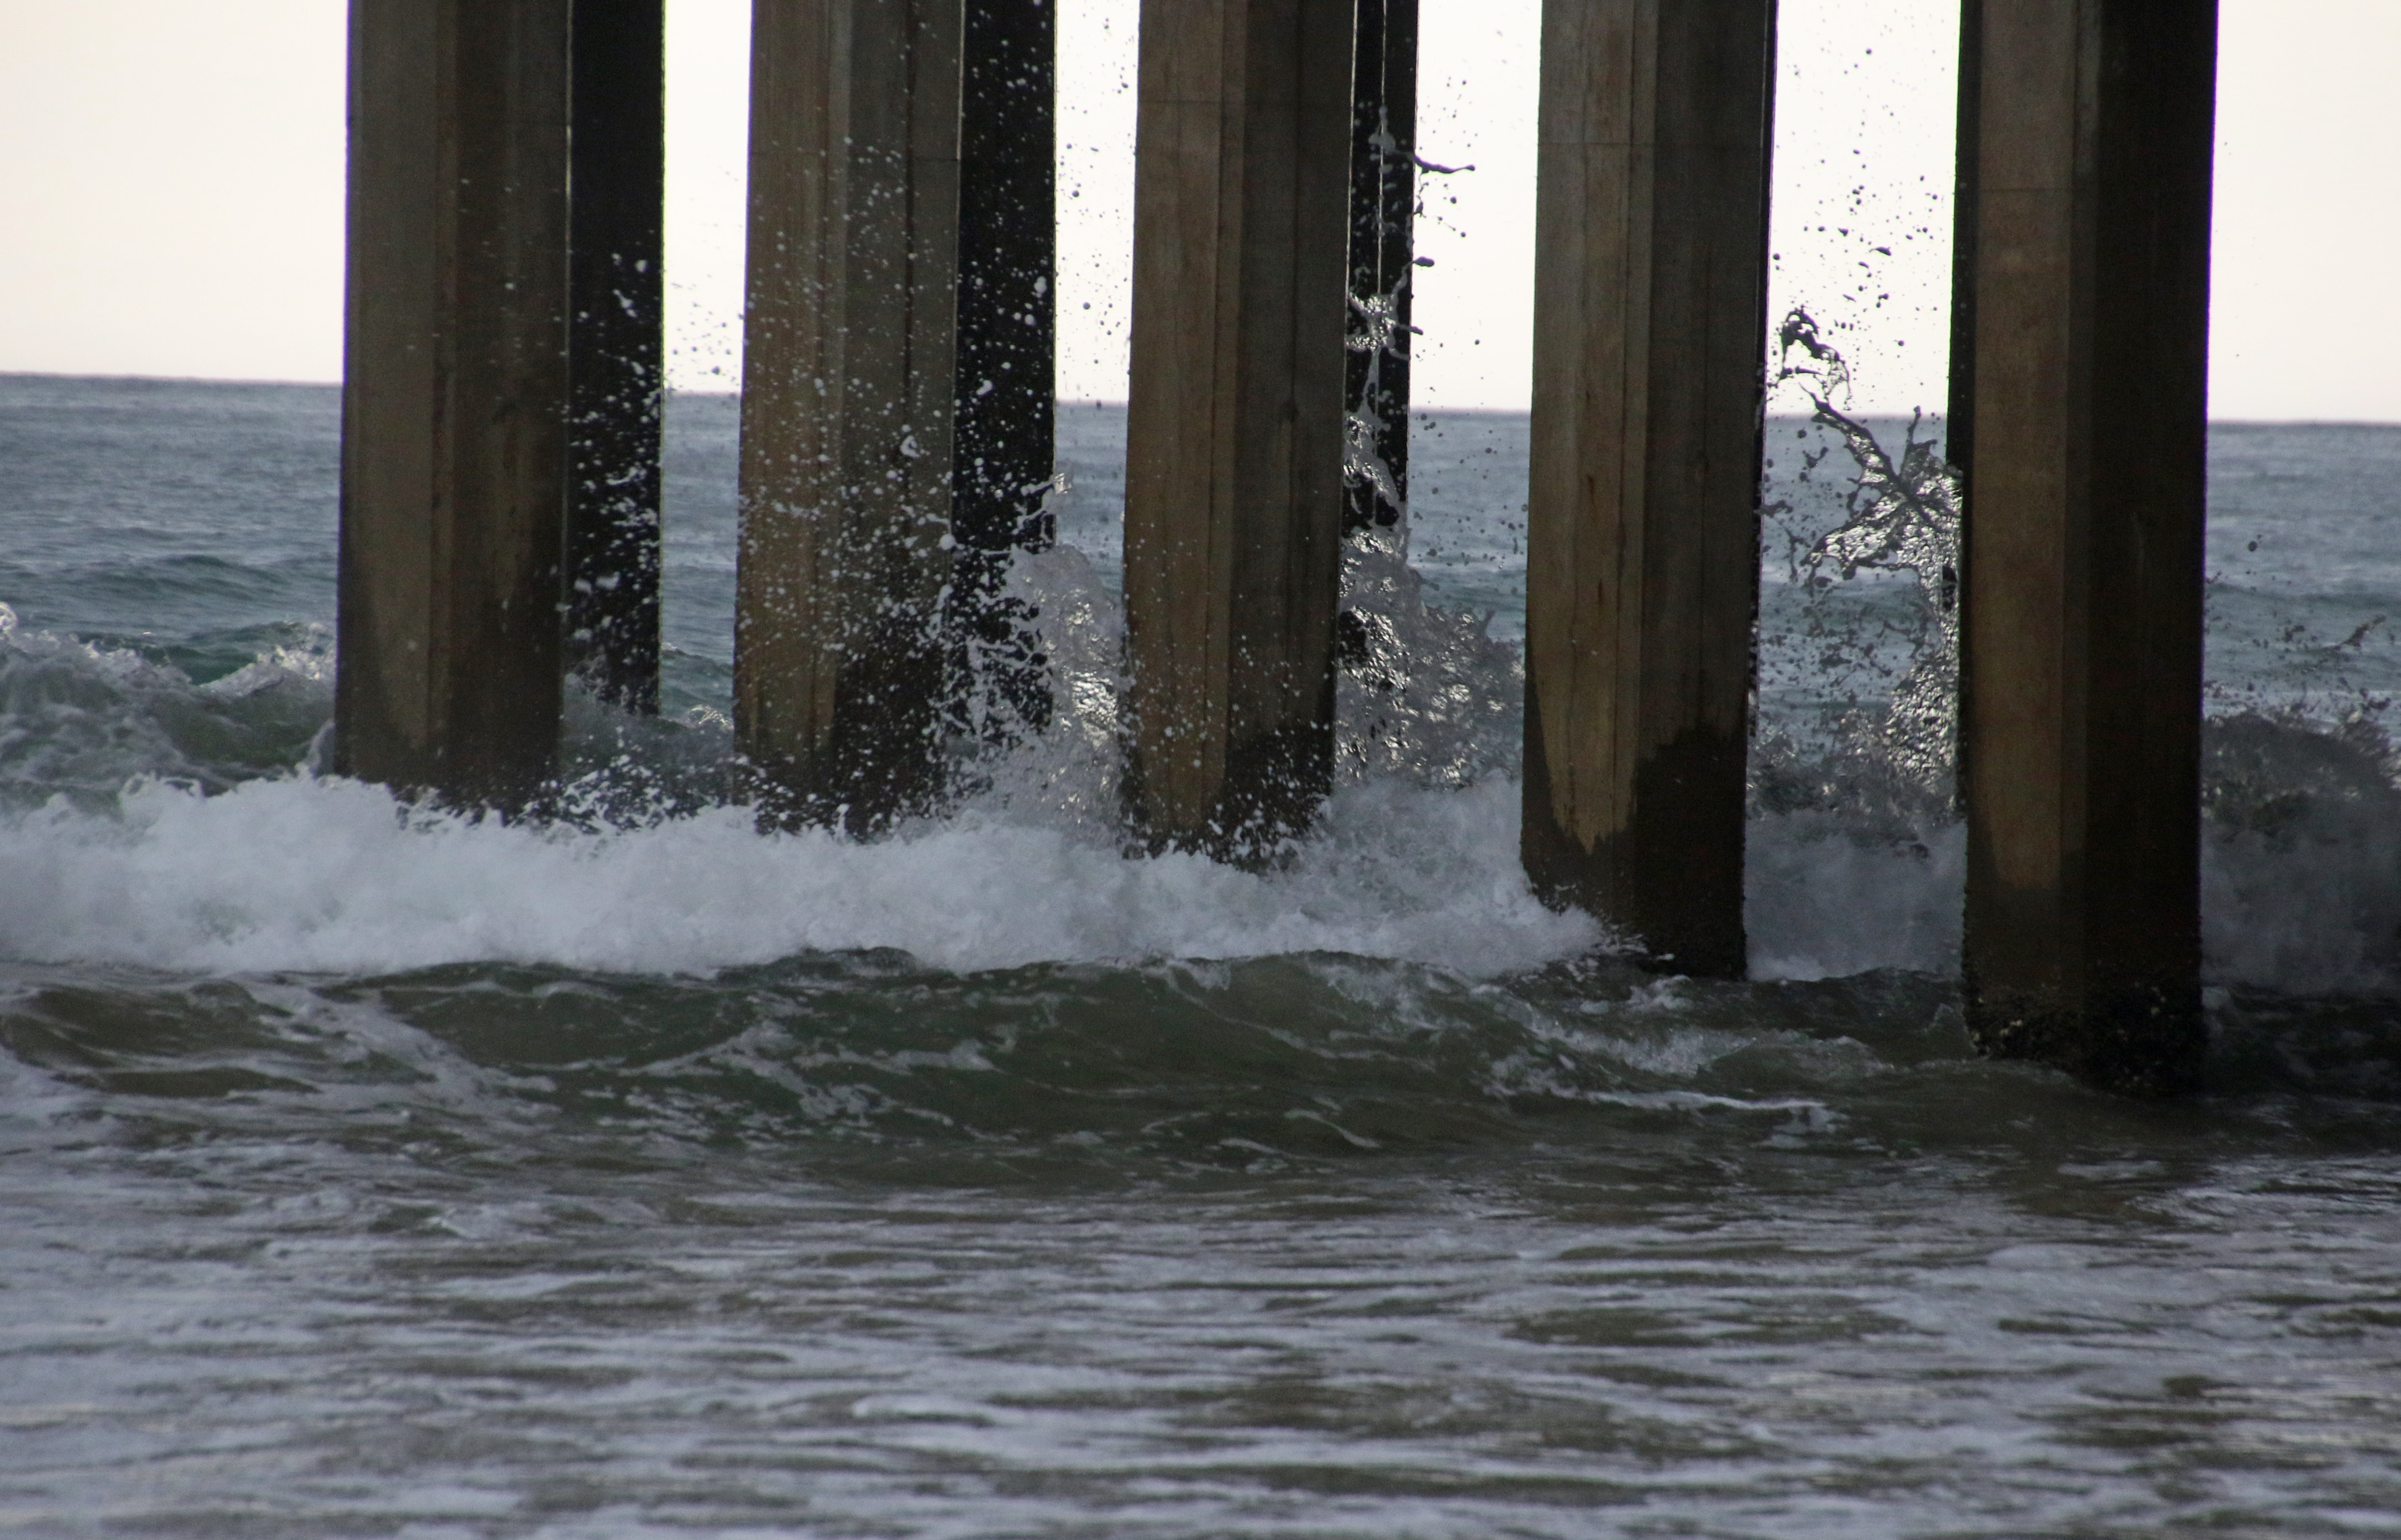 Waves crashing on the pier photo